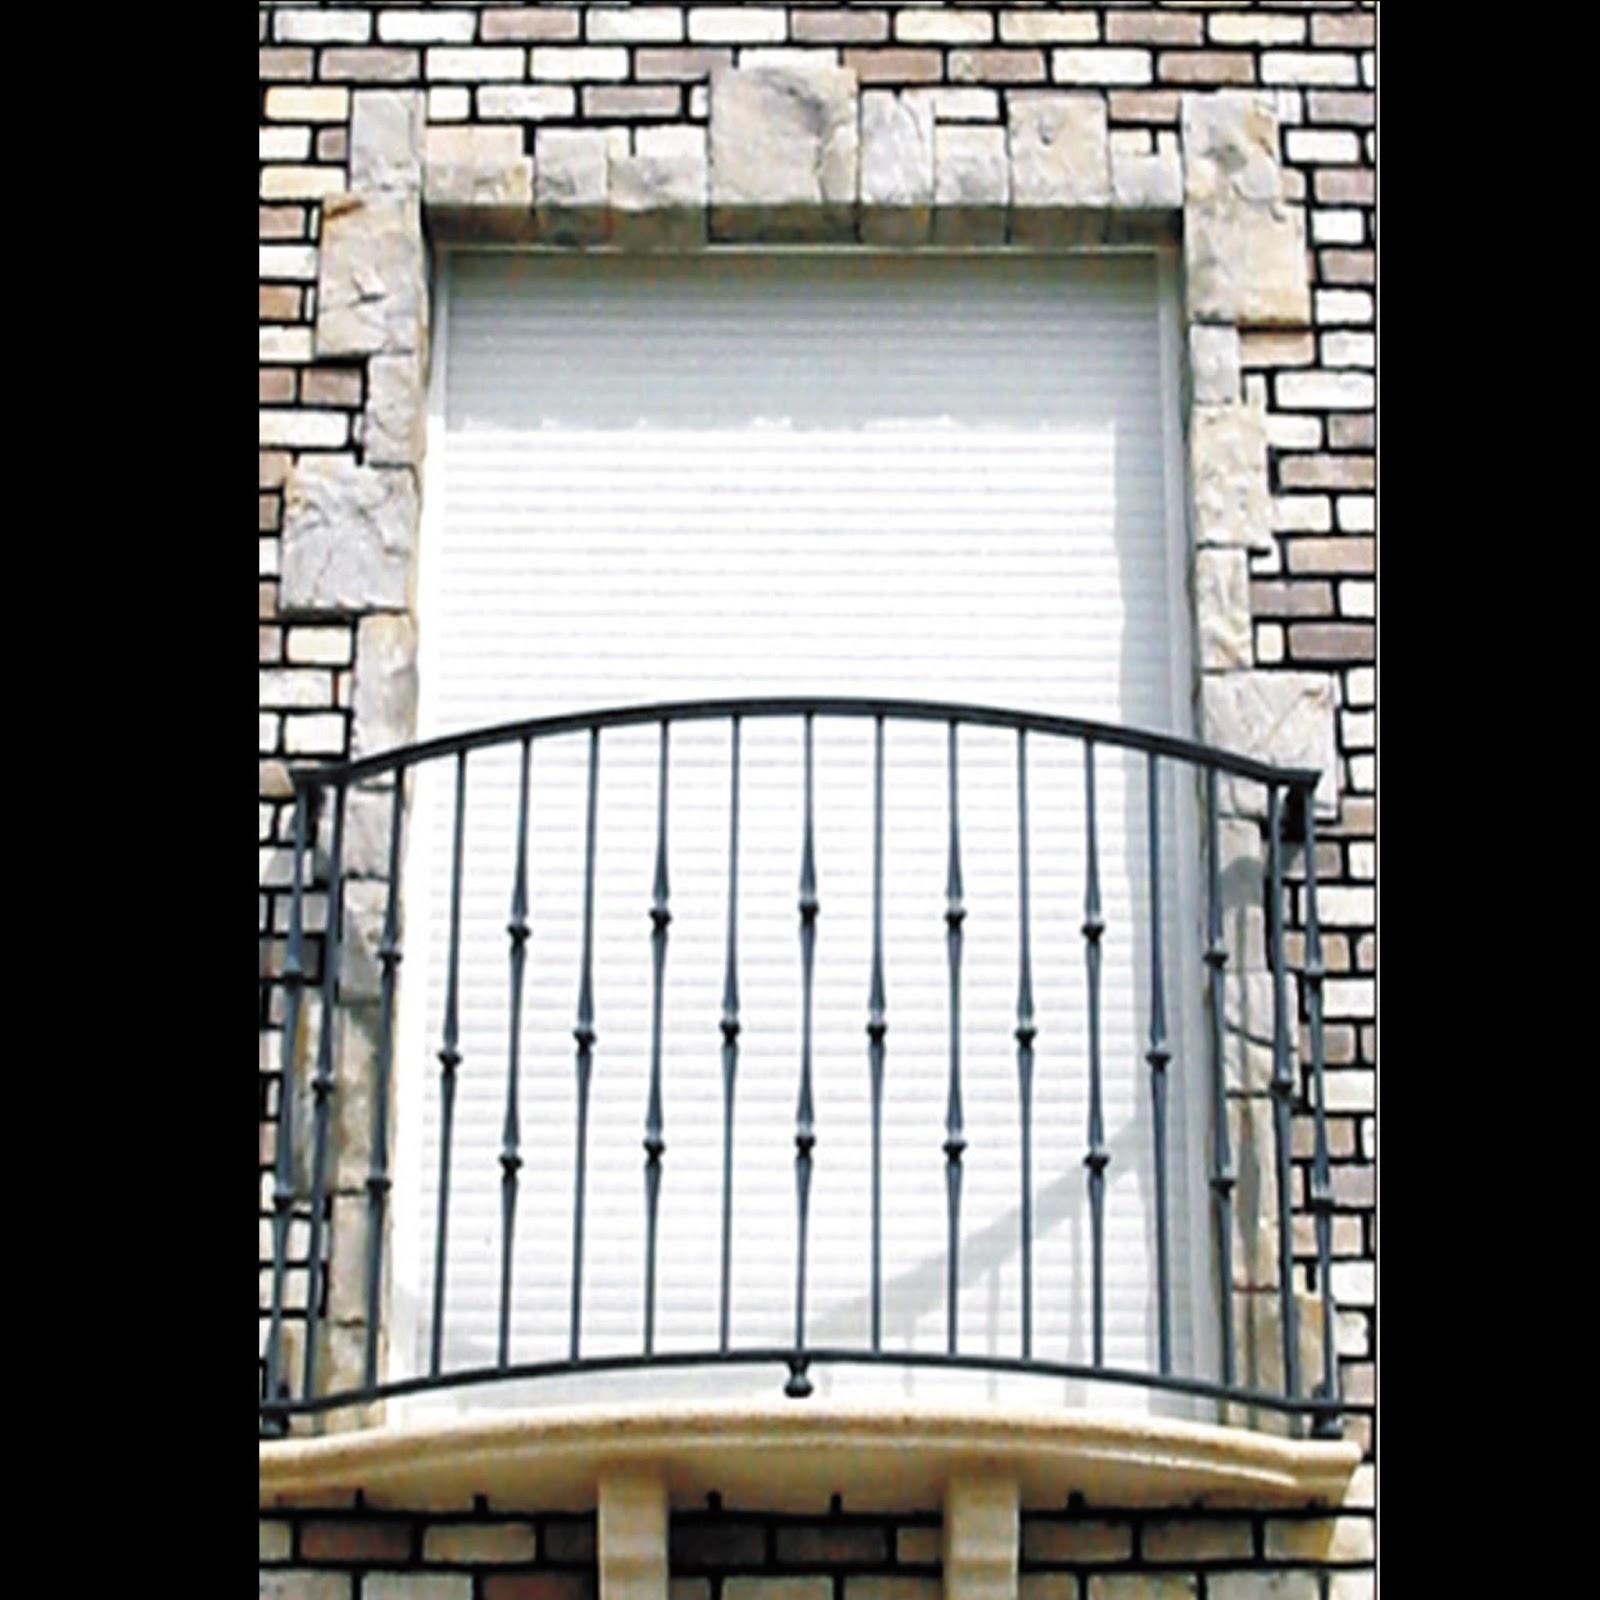 Grupo andreu balcones de forja art stica - Balcones de forja antiguos ...